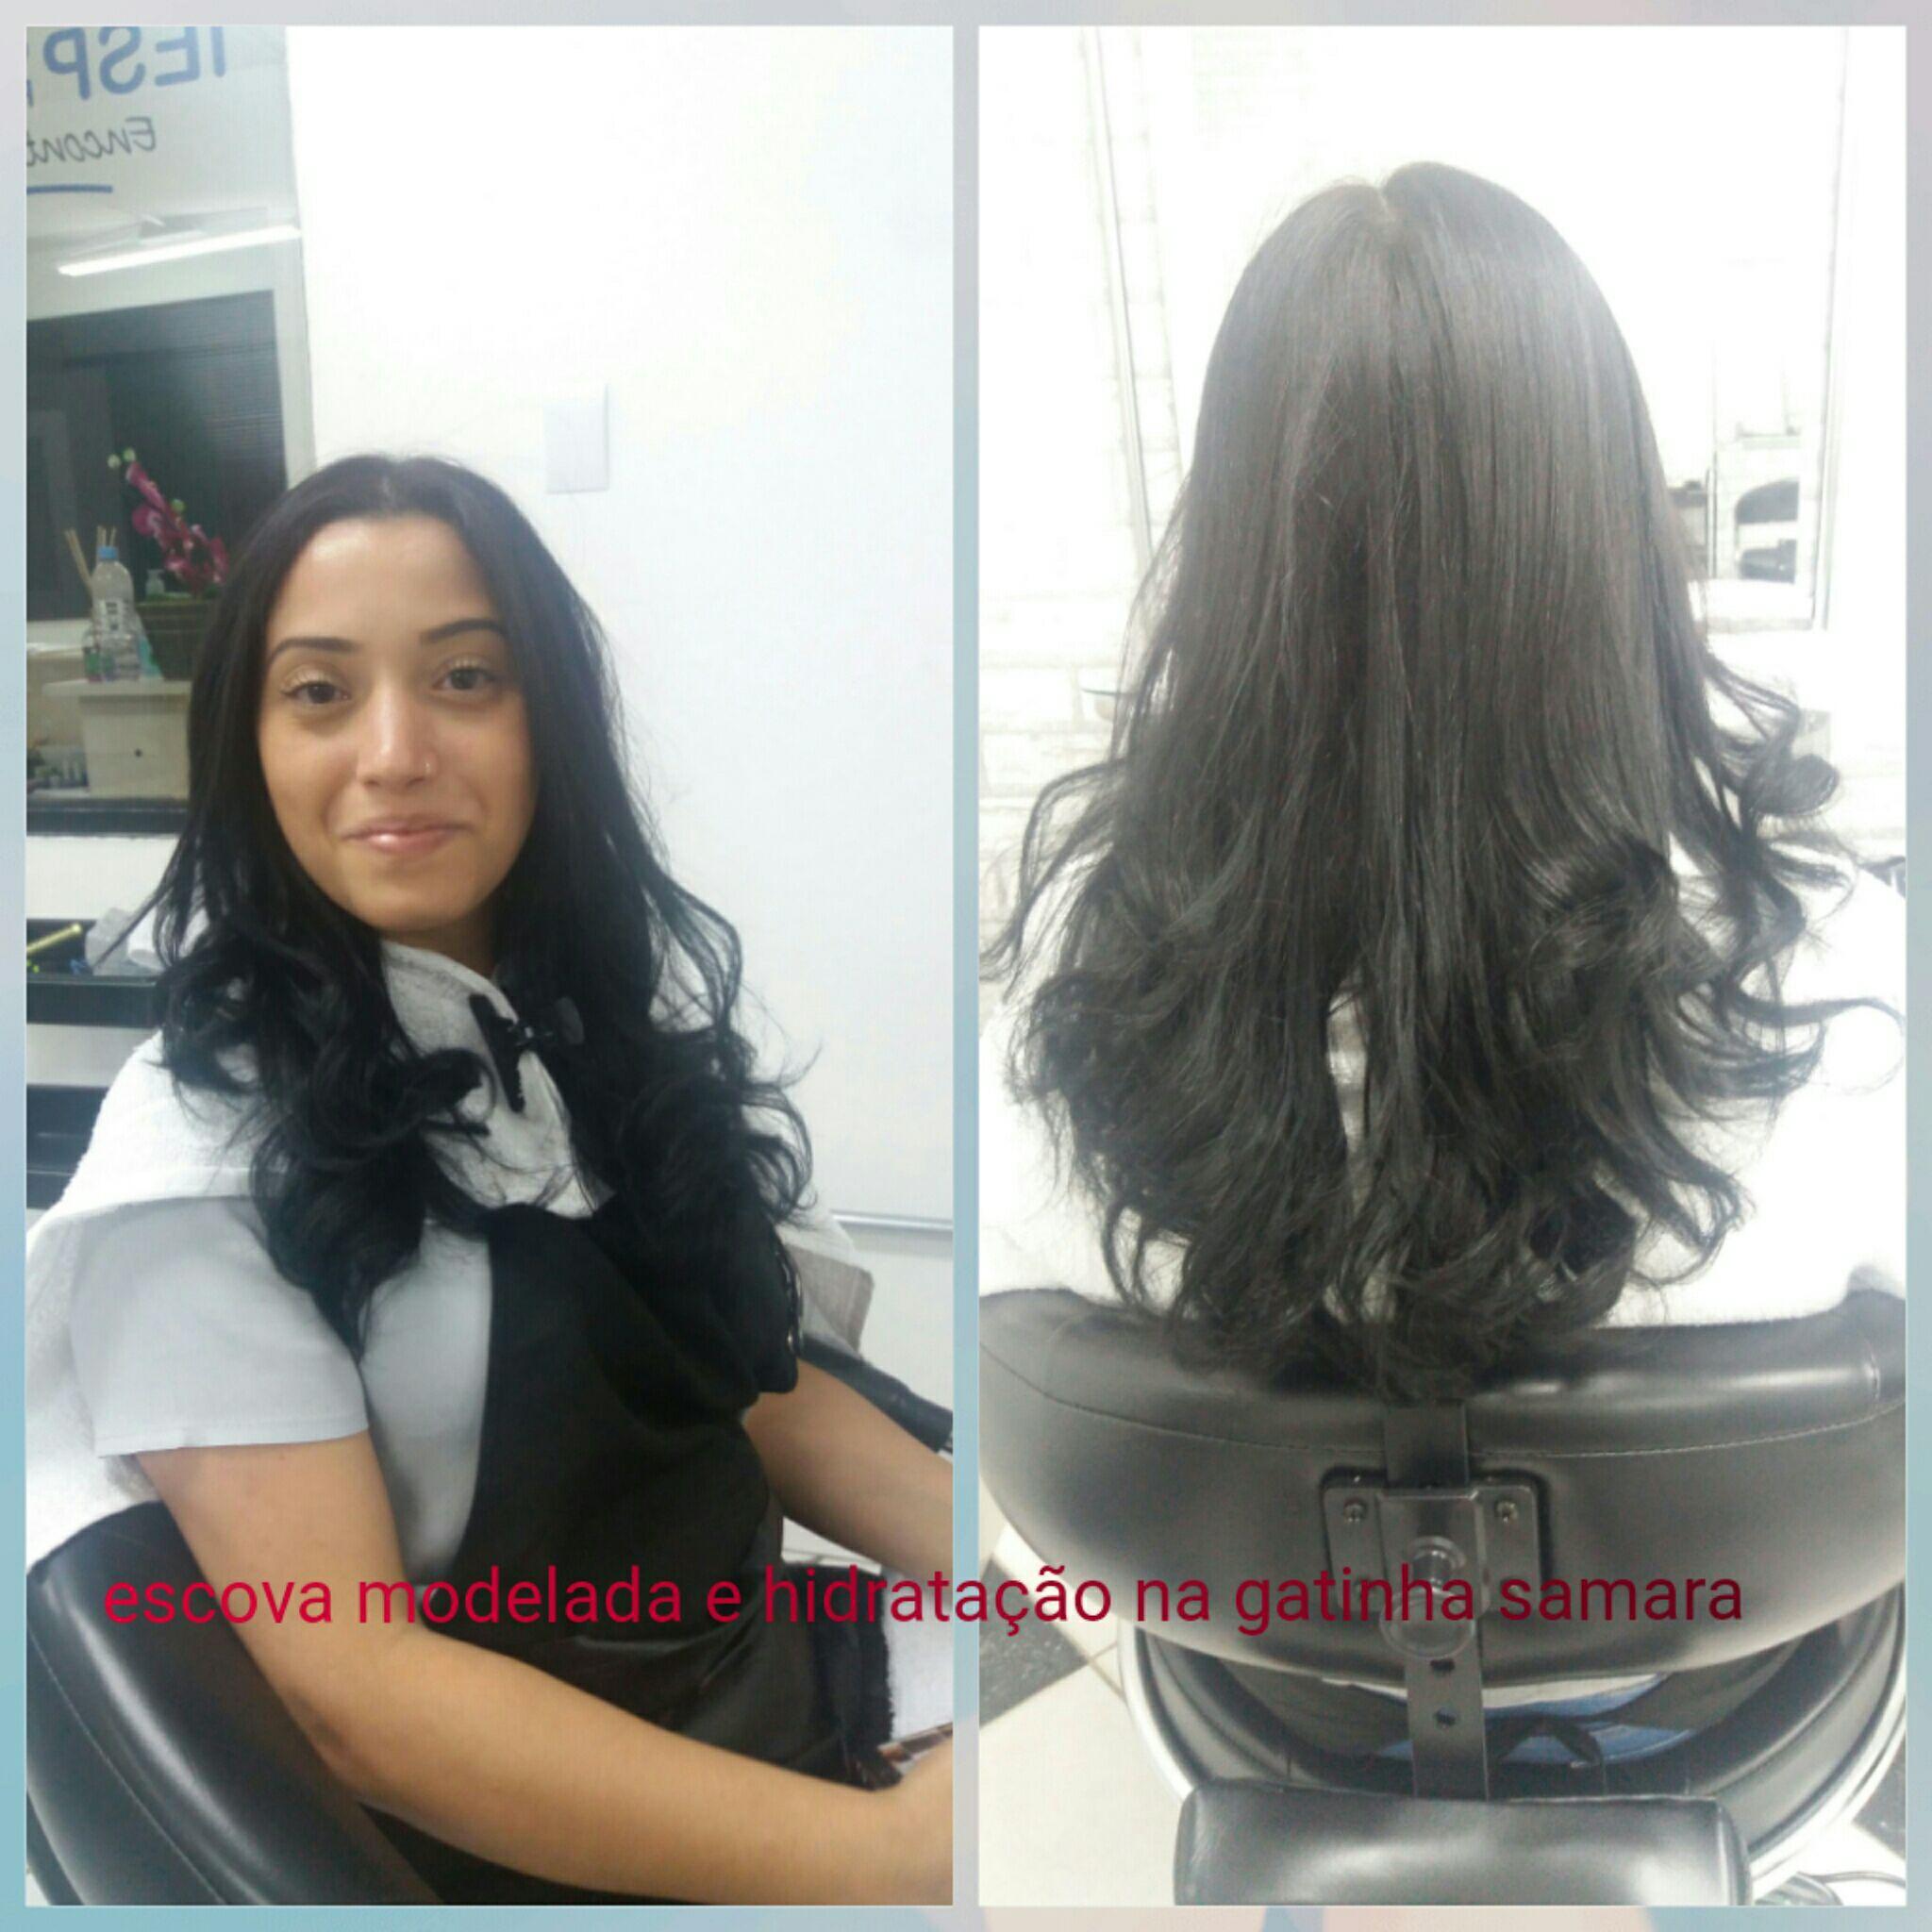 Escova modelada. cabelo auxiliar cabeleireiro(a) auxiliar cabeleireiro(a)